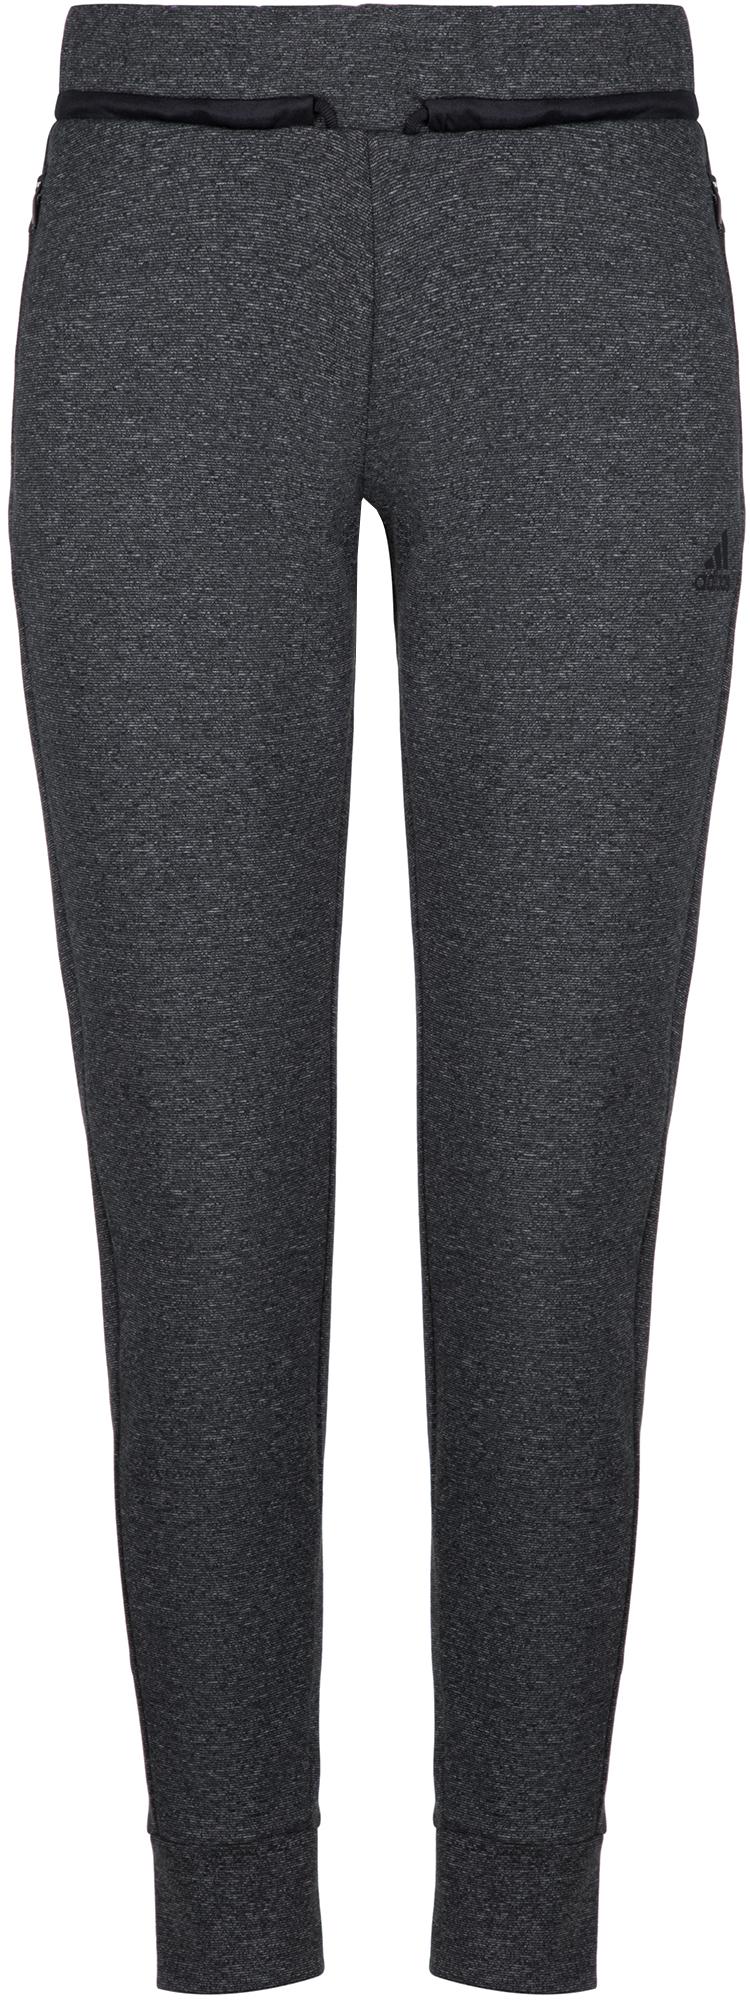 Adidas Брюки женские Adidas, размер 50-52 брюки спортивные adidas adidas ad002emeehm0